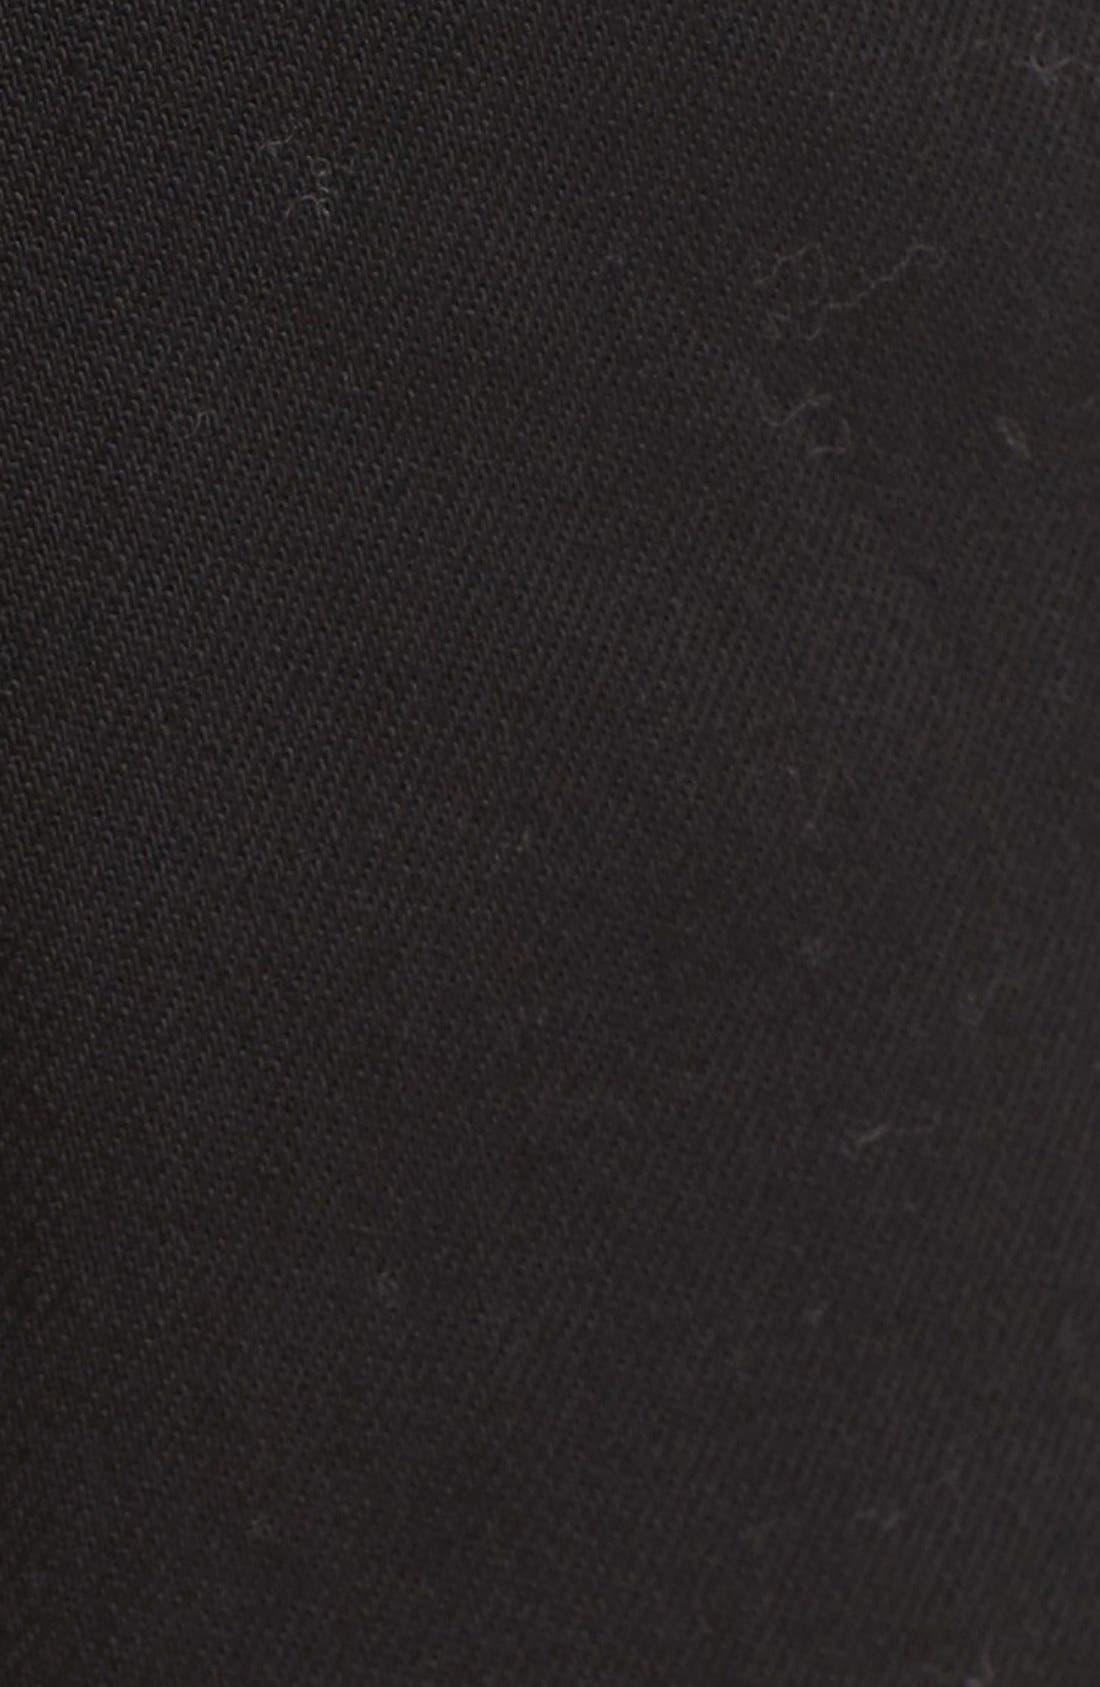 ACNE STUDIOS,                             Town Straight Leg Jeans,                             Alternate thumbnail 6, color,                             001